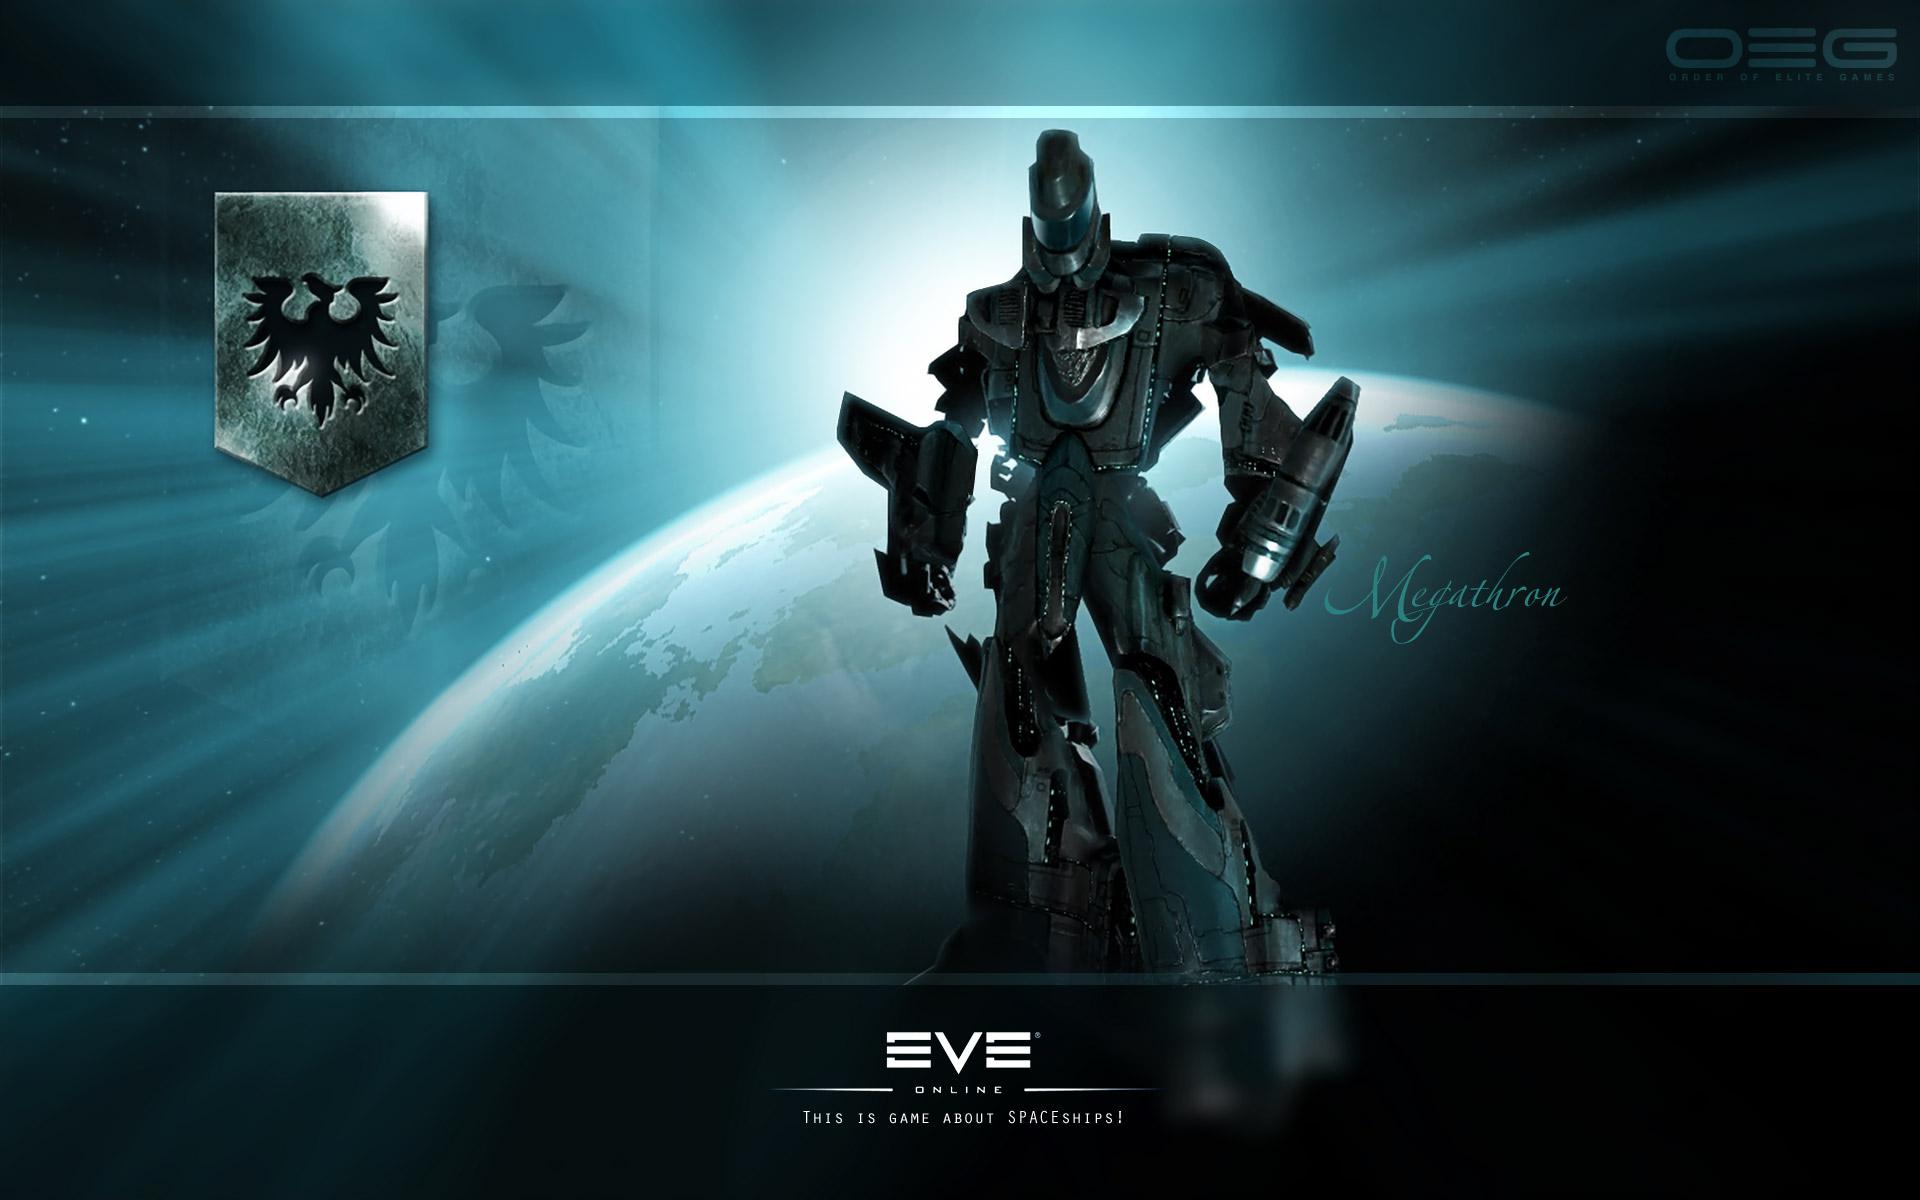 EVE Online HD Wallpaper